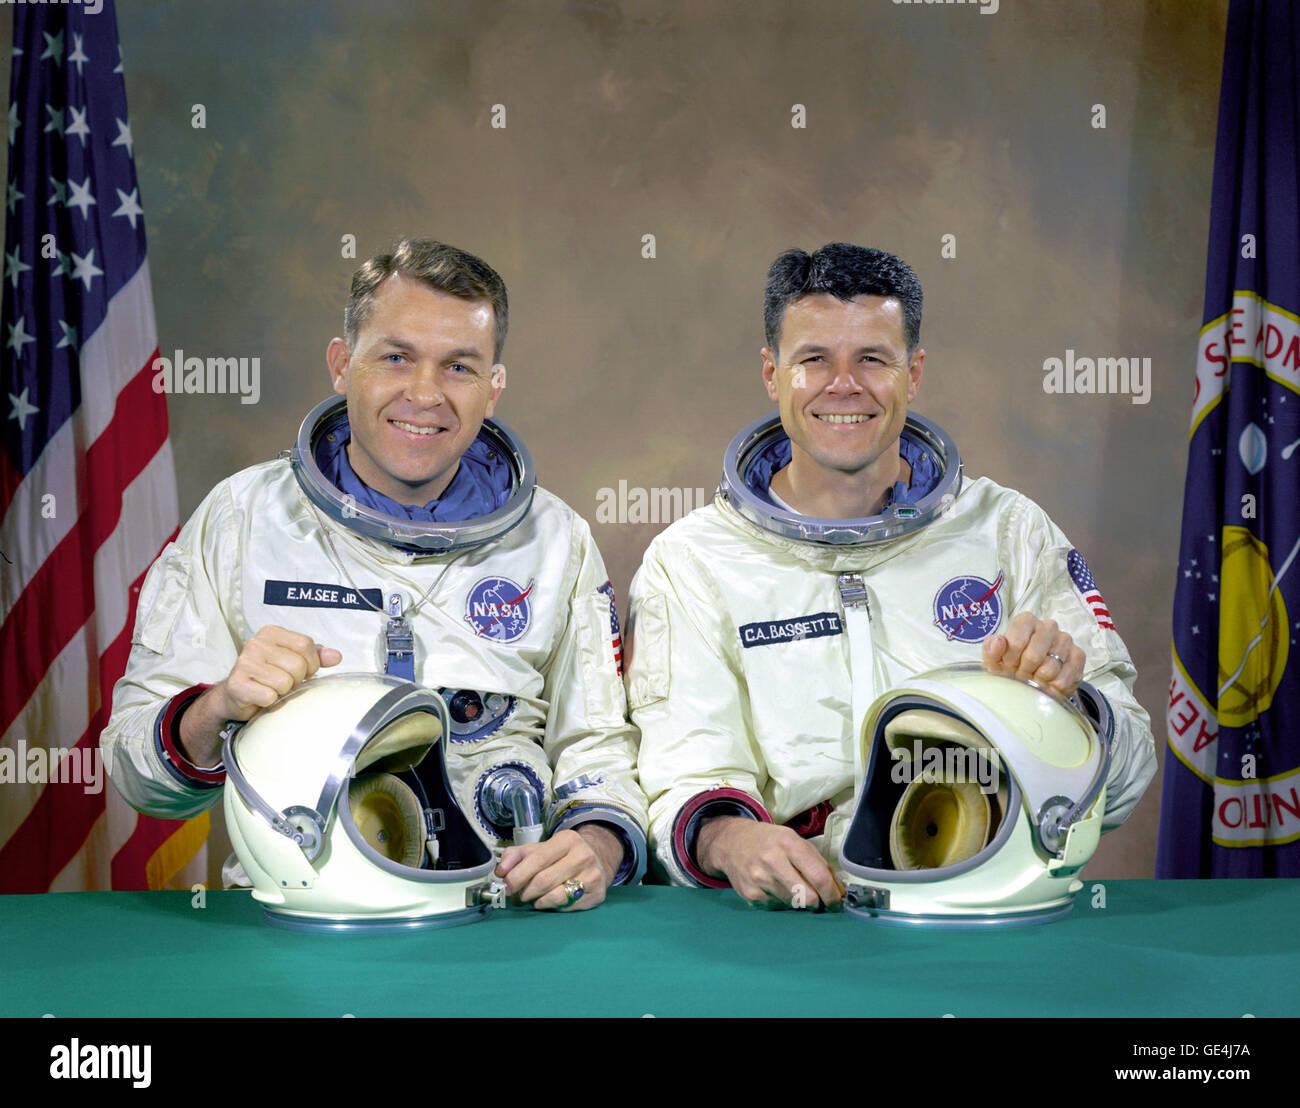 The original Gemini 9 prime crew, astronauts Elliot M. See Jr. (left), command pilot, and Charles A. Bassett II, Stock Photo